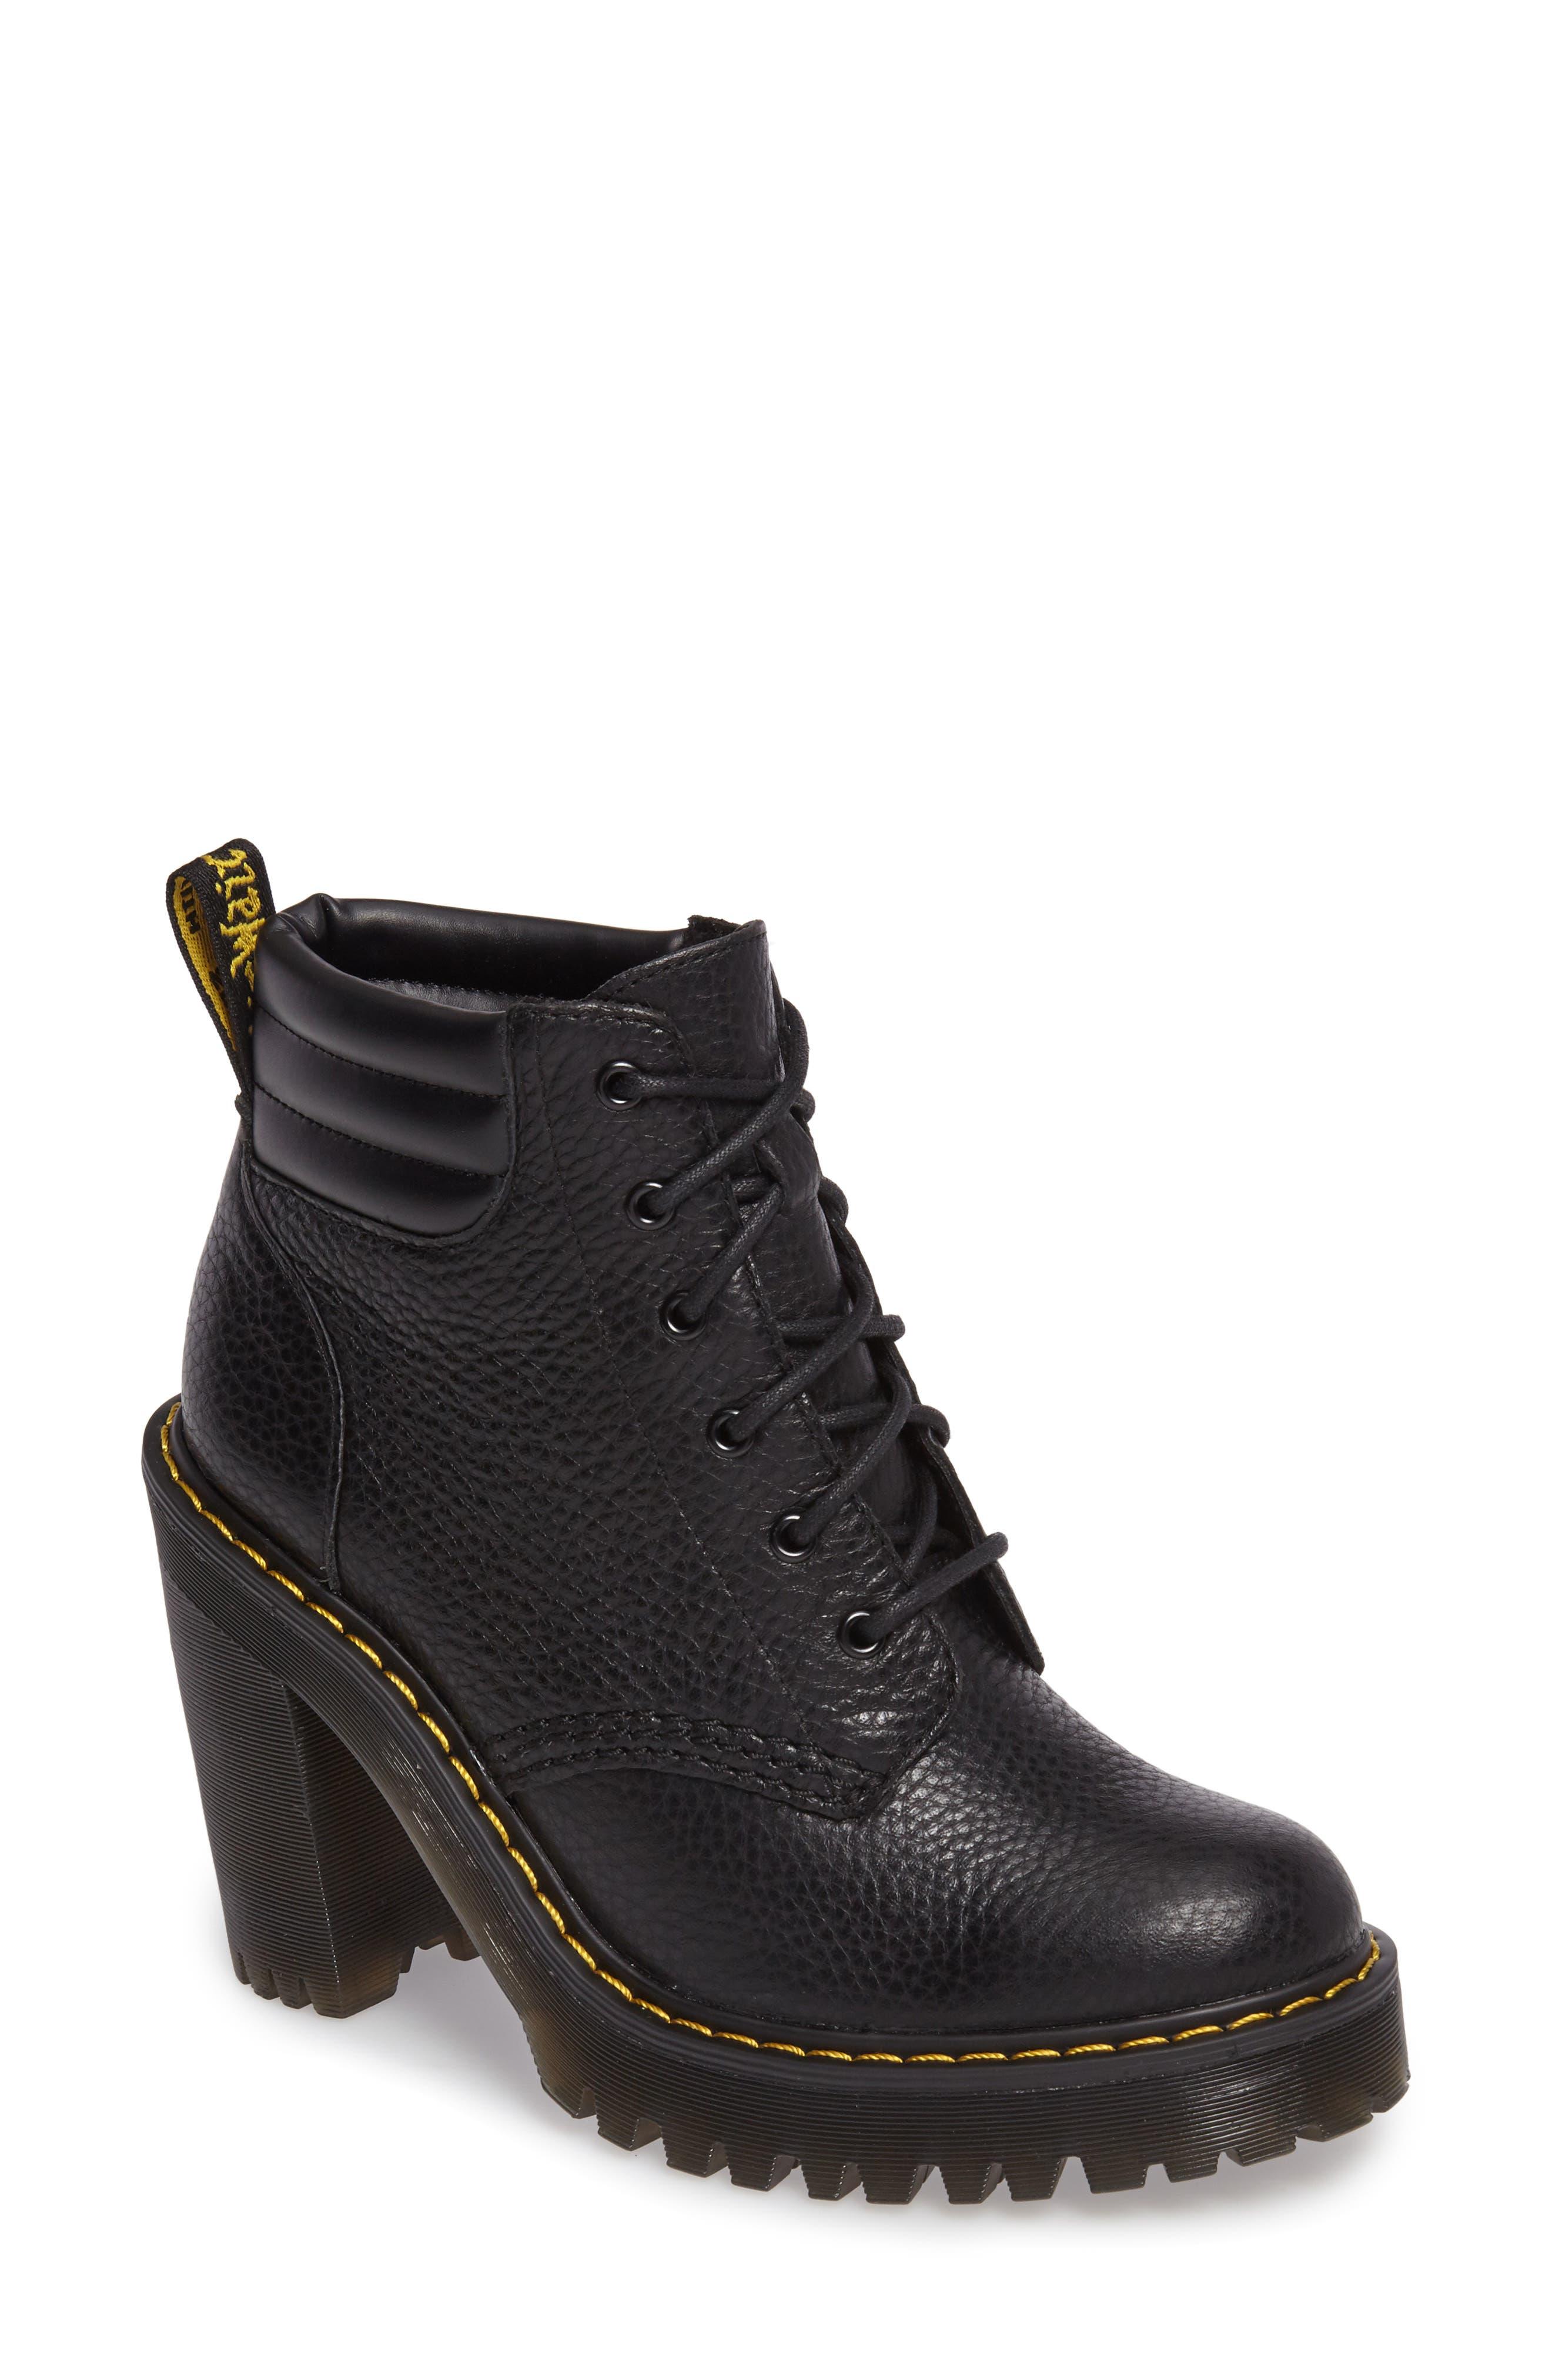 Persephone Platform Boot,                             Main thumbnail 1, color,                             Black Leather